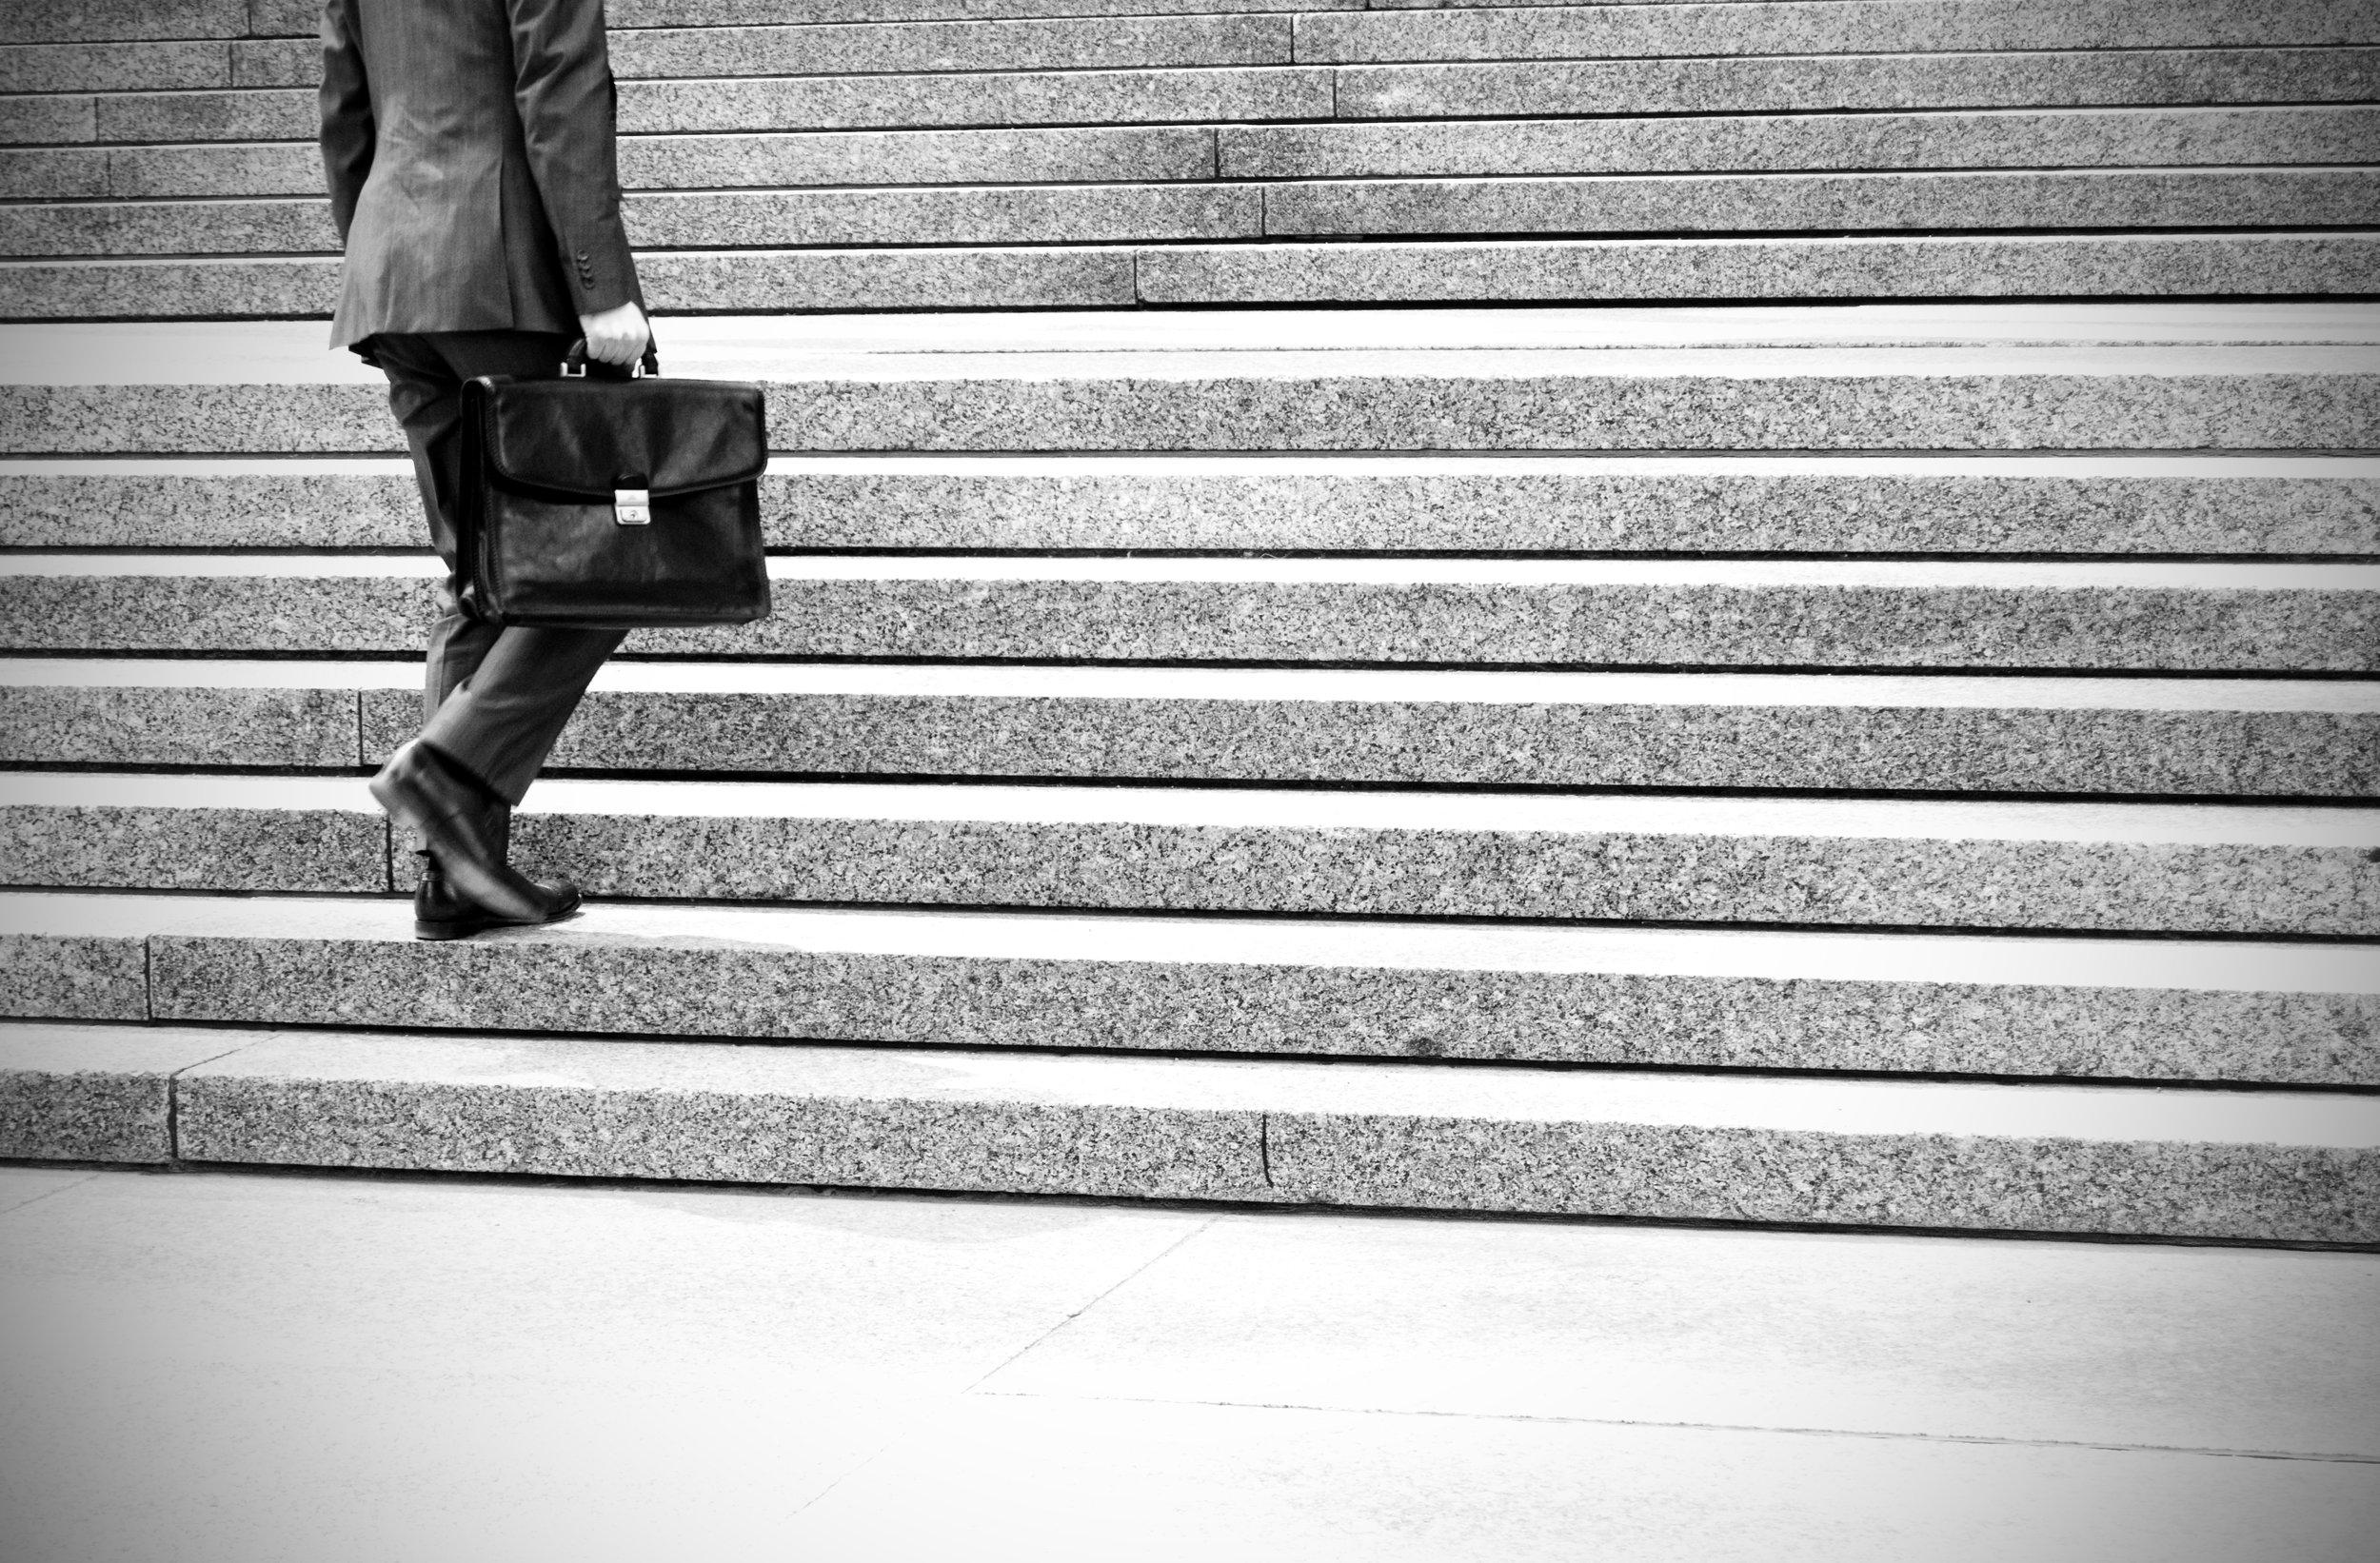 court+steps+-+shutterstock_171934772.jpg